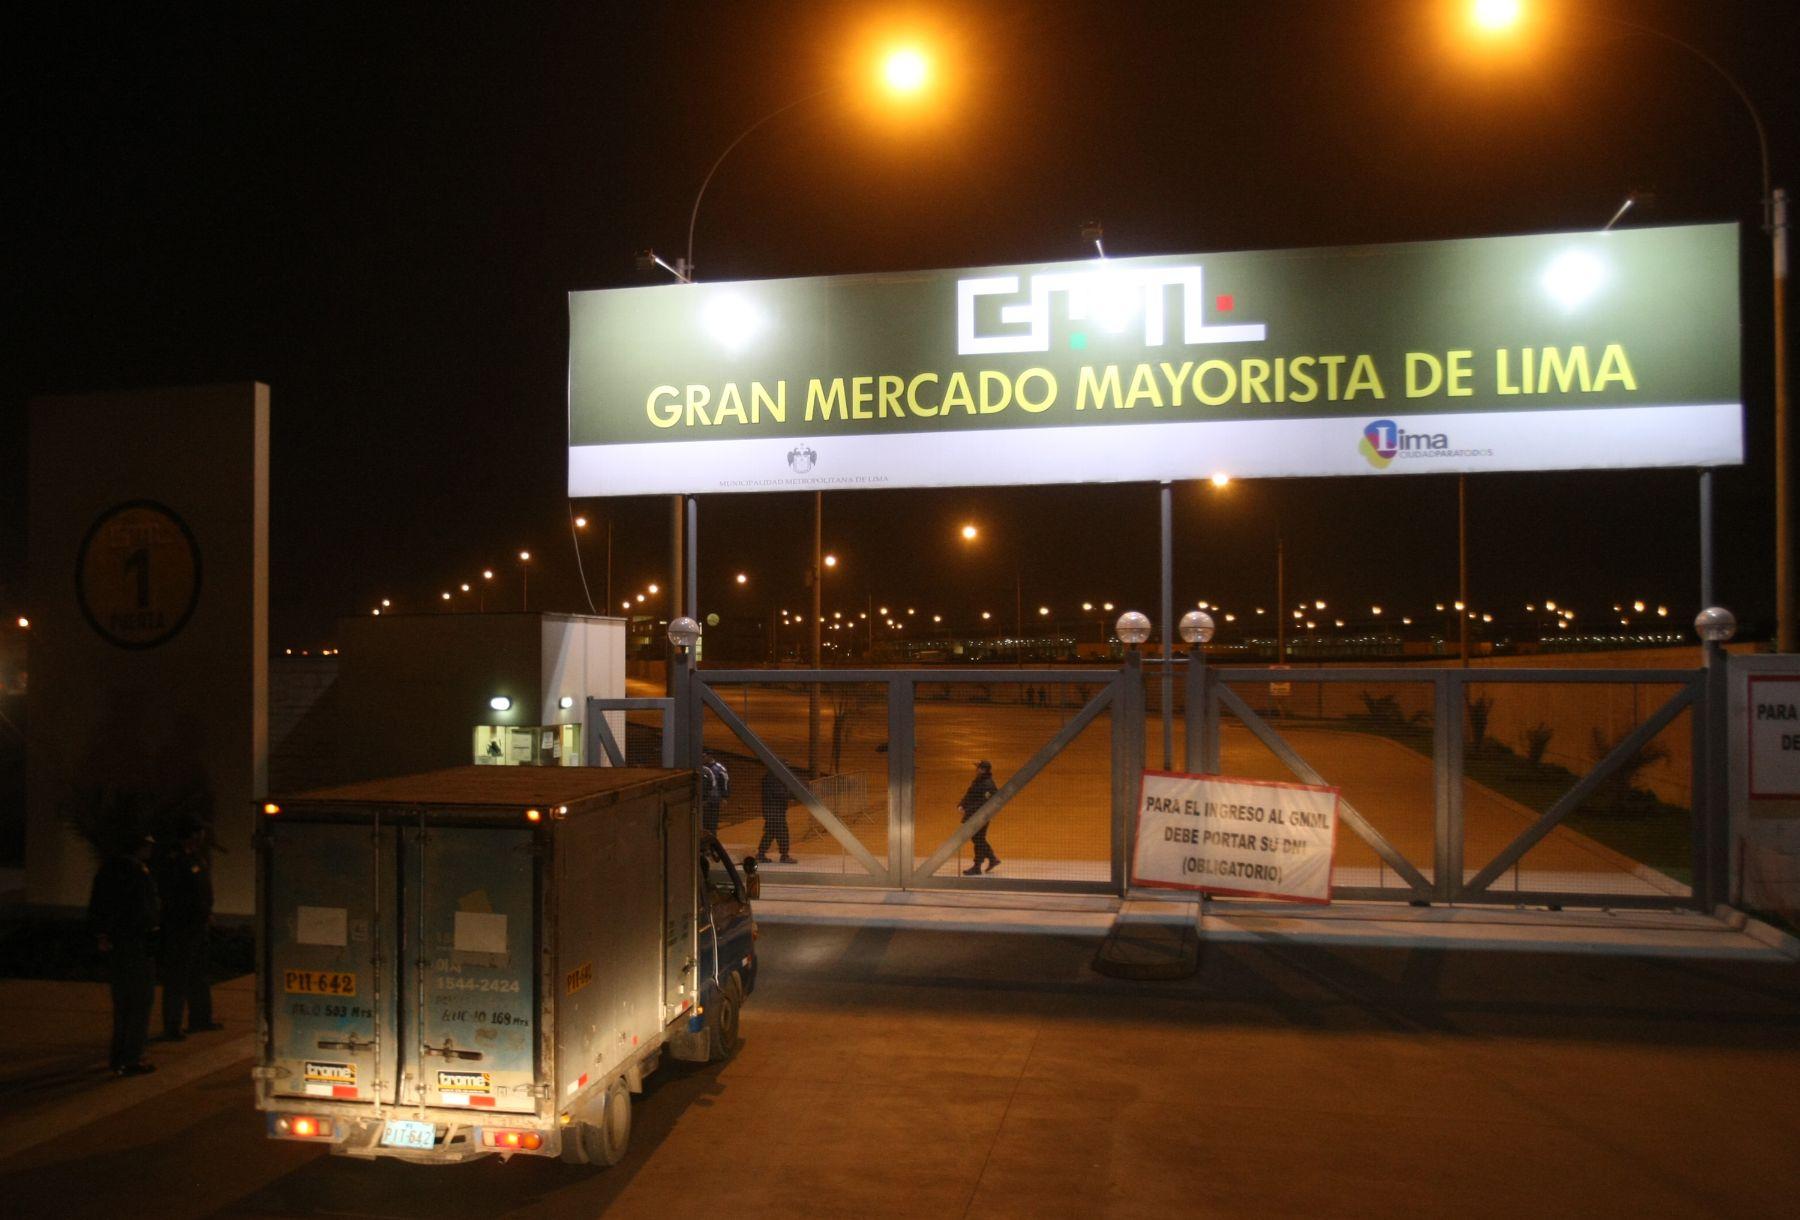 Ingresan camiones de carga al nuevo mercado de Santa Anita. Foto: ANDINA/Vidal Tarqui ANDINA/Vidal Tarqui.